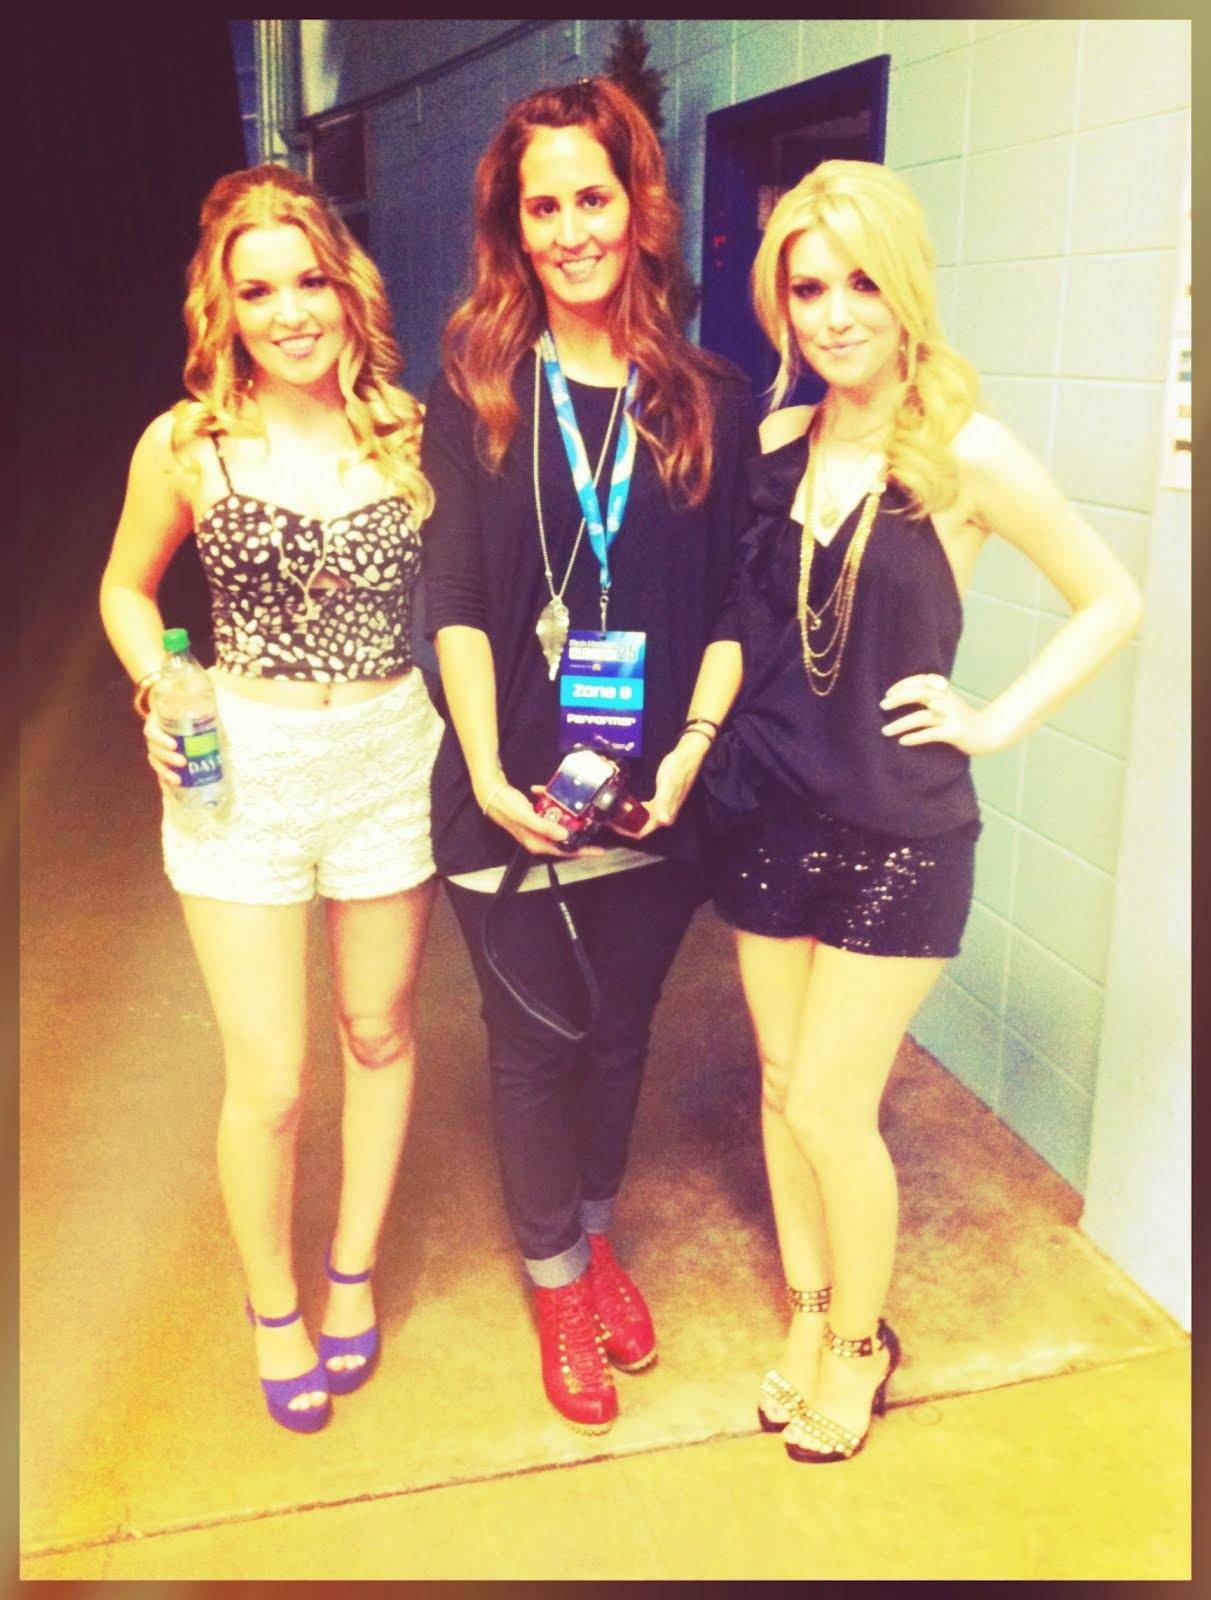 Sachi Parker Hot pics & movies Rebecca Corry,Margo Harshman